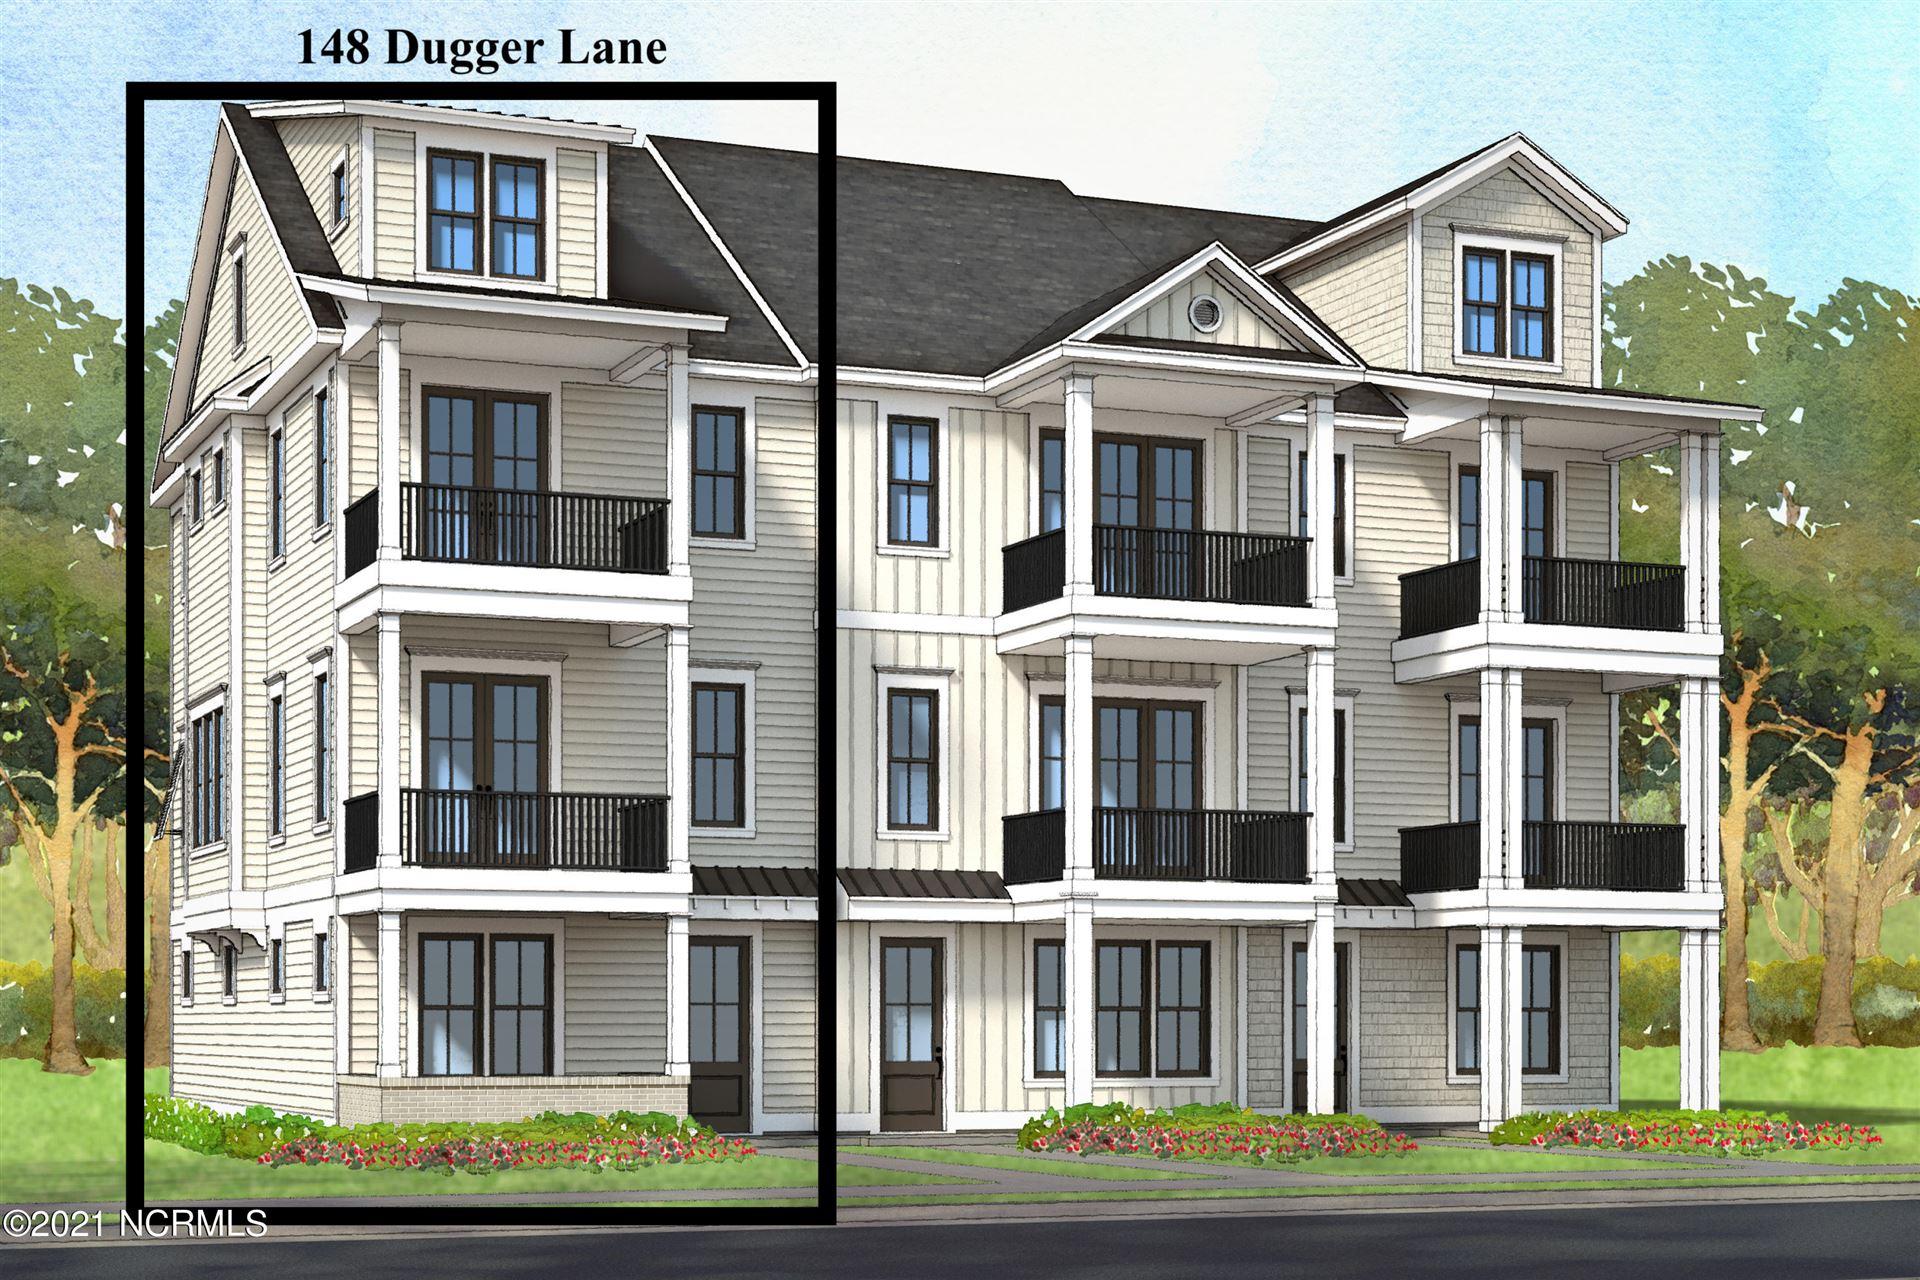 Photo for 148 Dugger Lane, Wilmington, NC 28412 (MLS # 100286698)